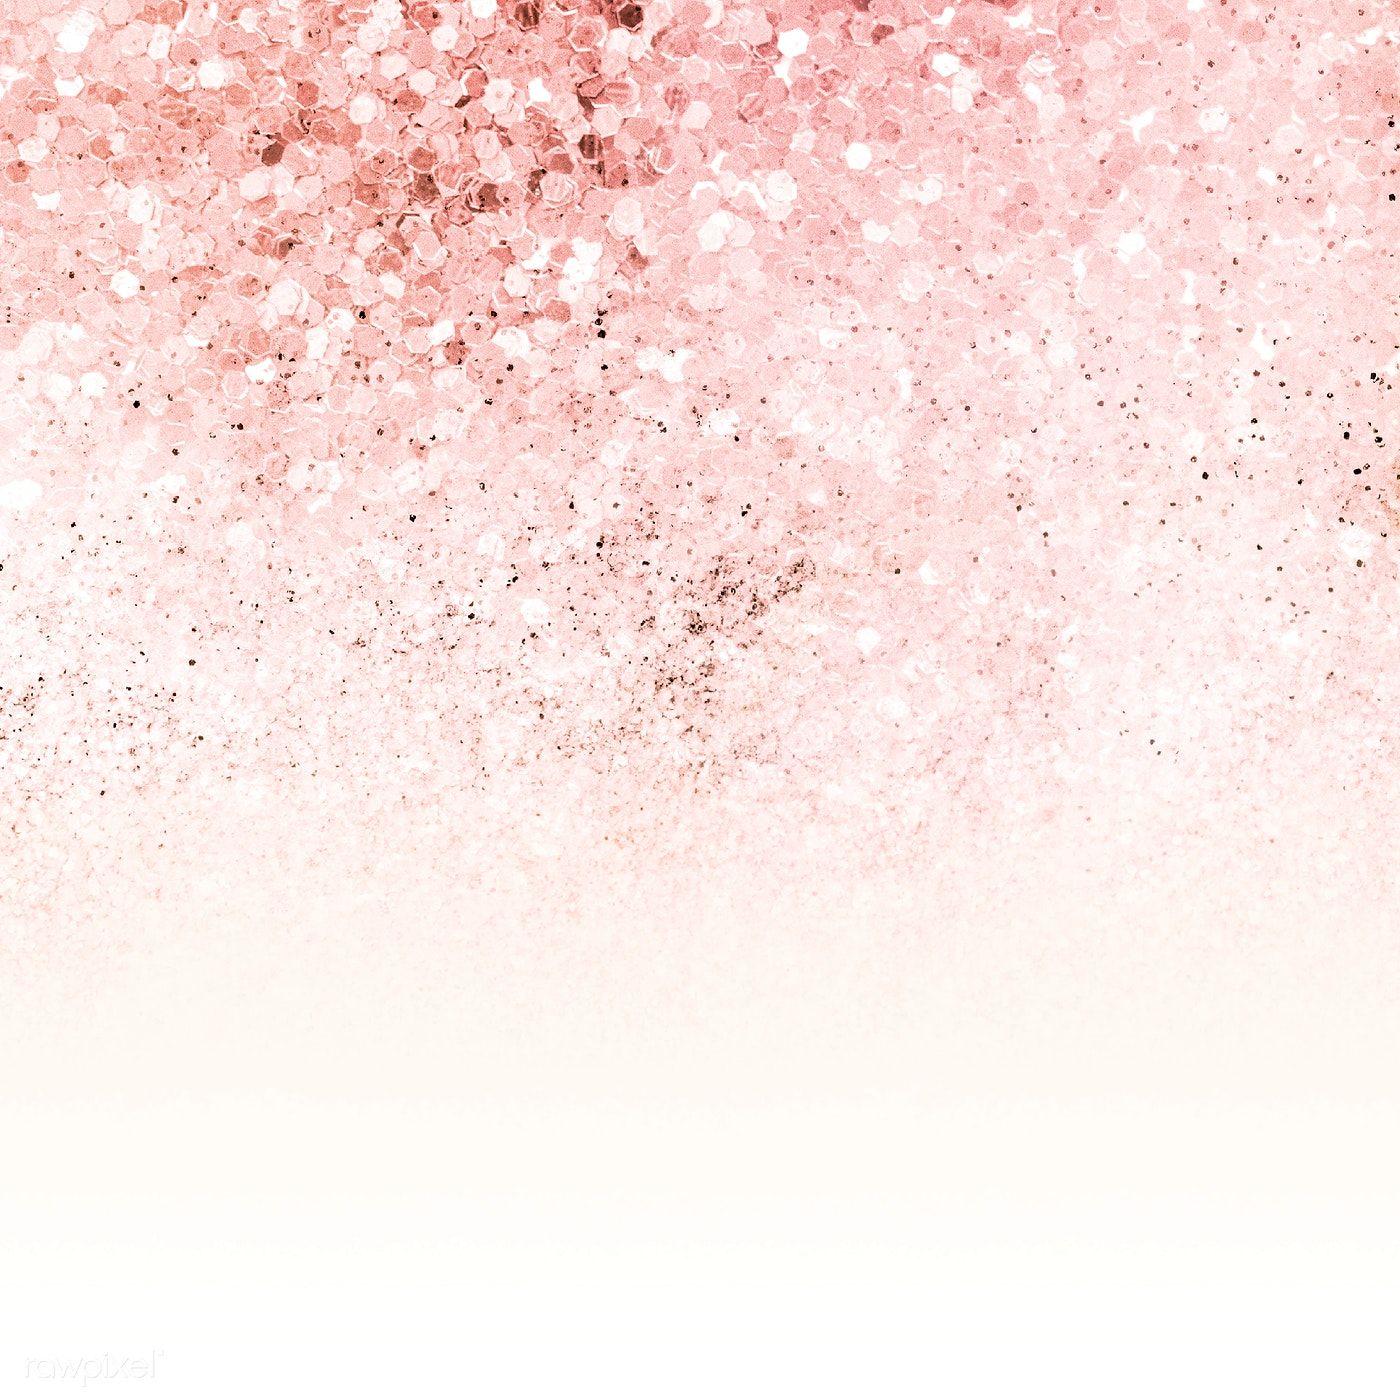 Download premium illustration of Pink ombre glitter